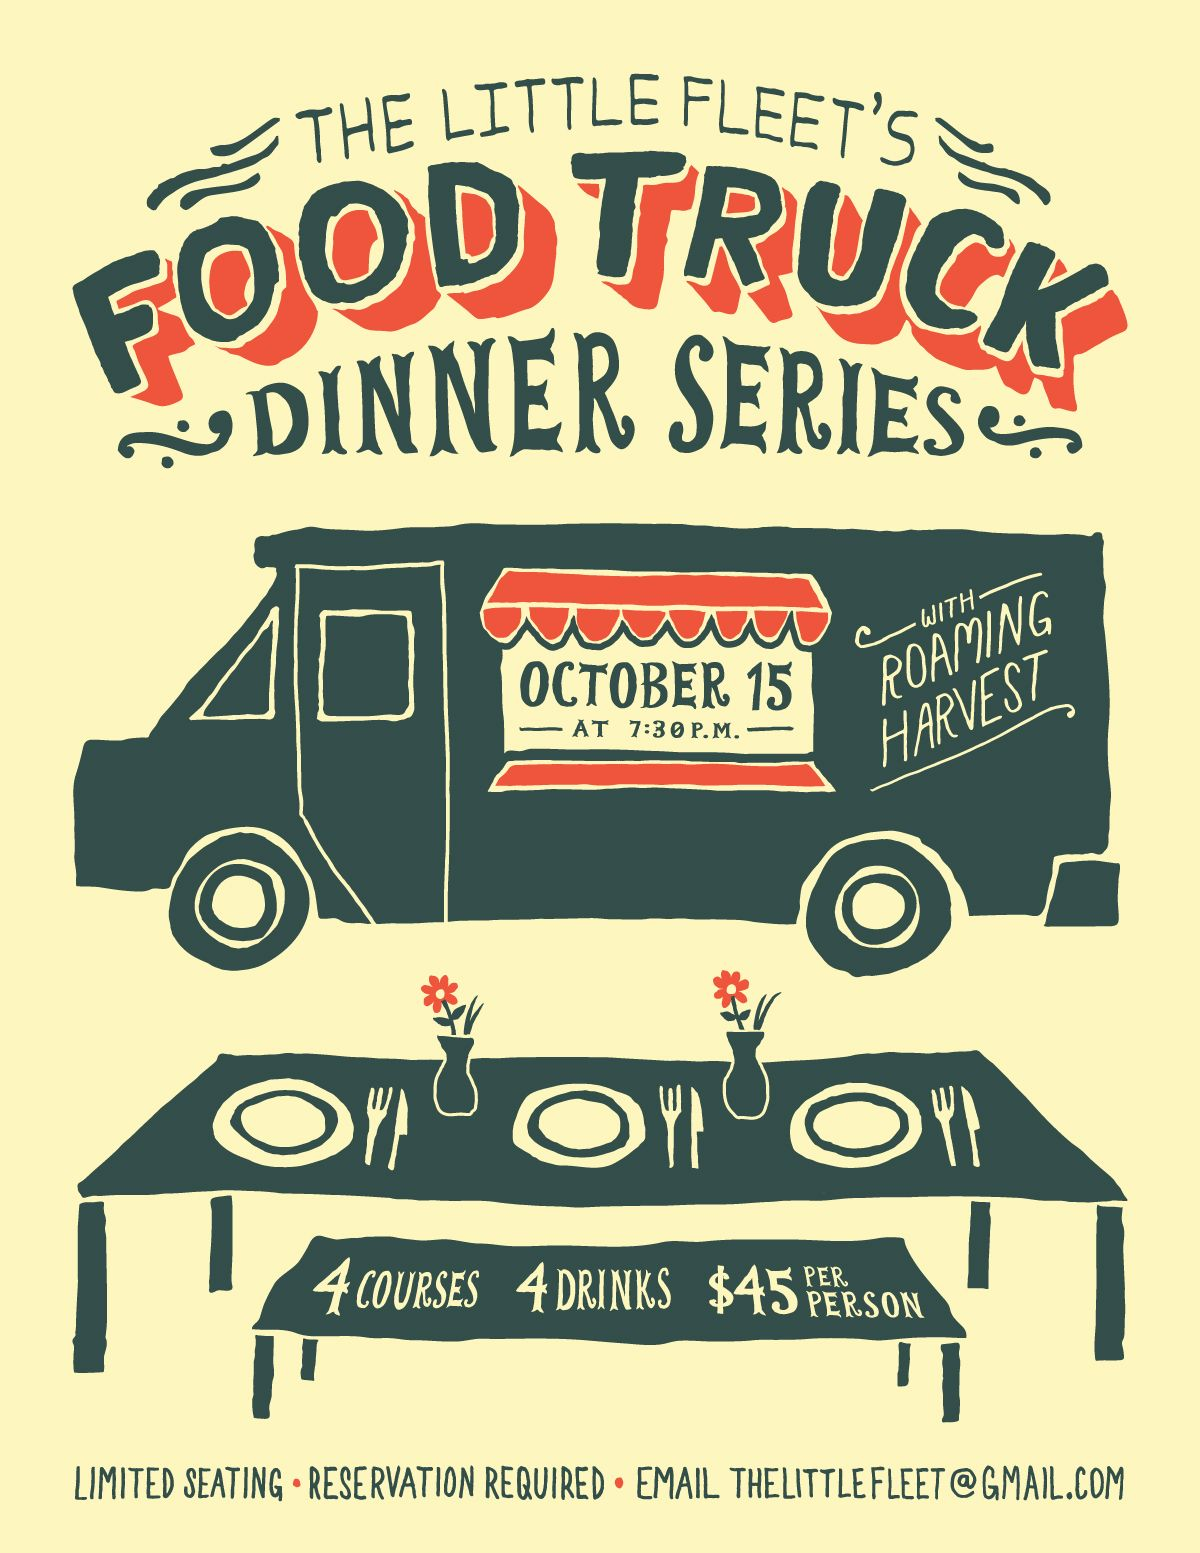 TLF food truck dinner Jordan Dale Young Food truck